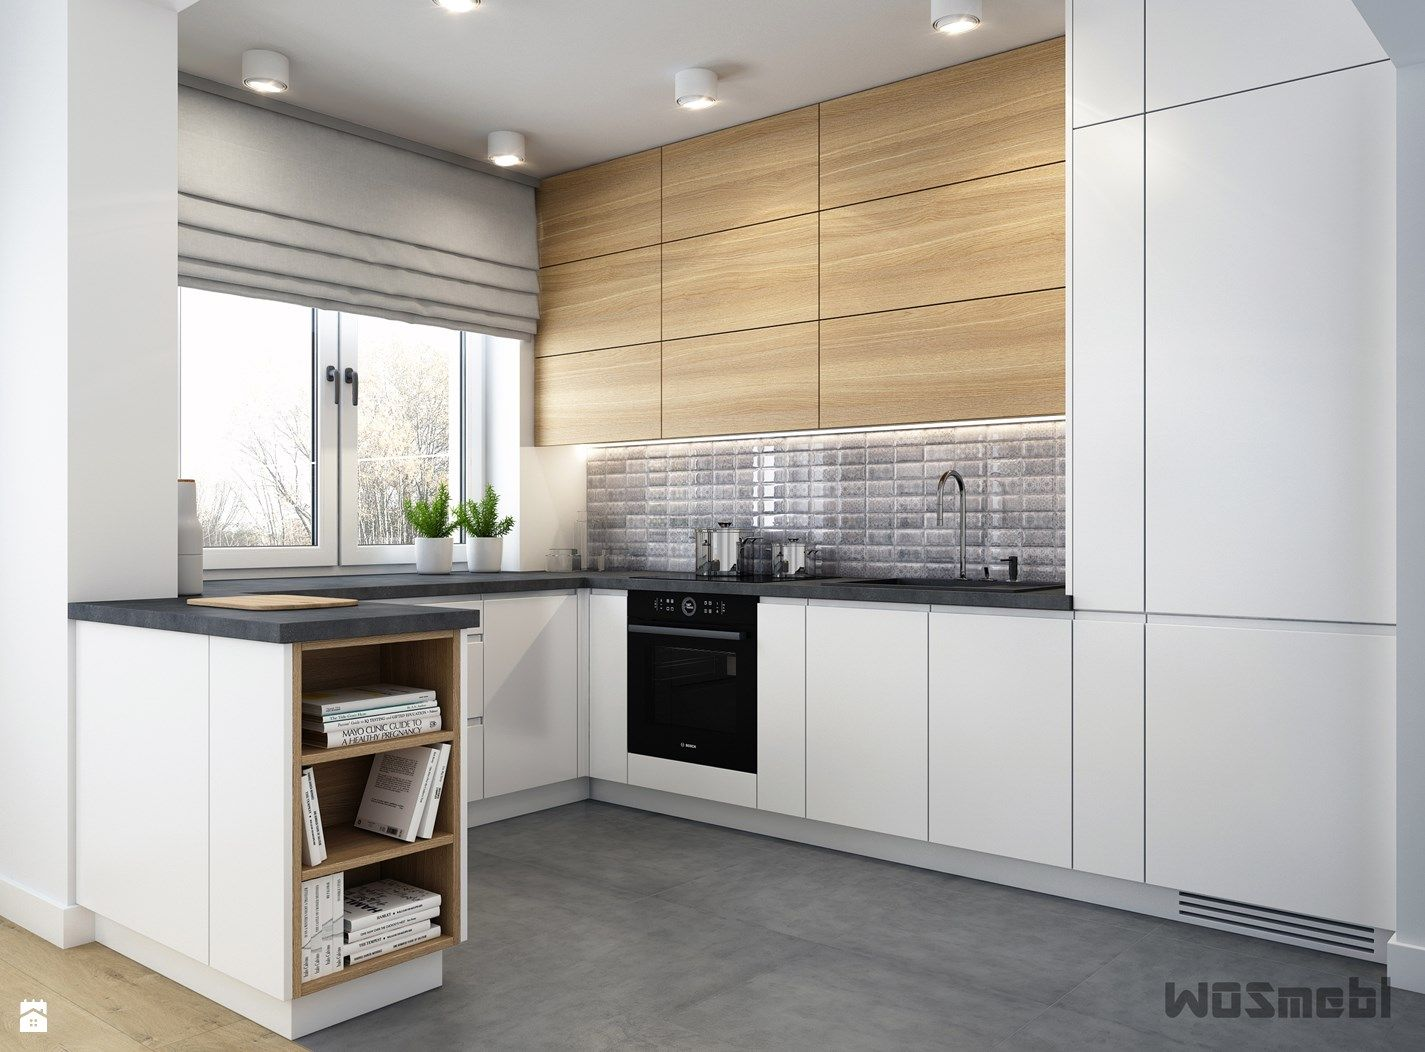 Pin By Natalia On Kuchnia Inspiracje Interior Design Kitchen Modern Kitchen Design Modern Kitchen